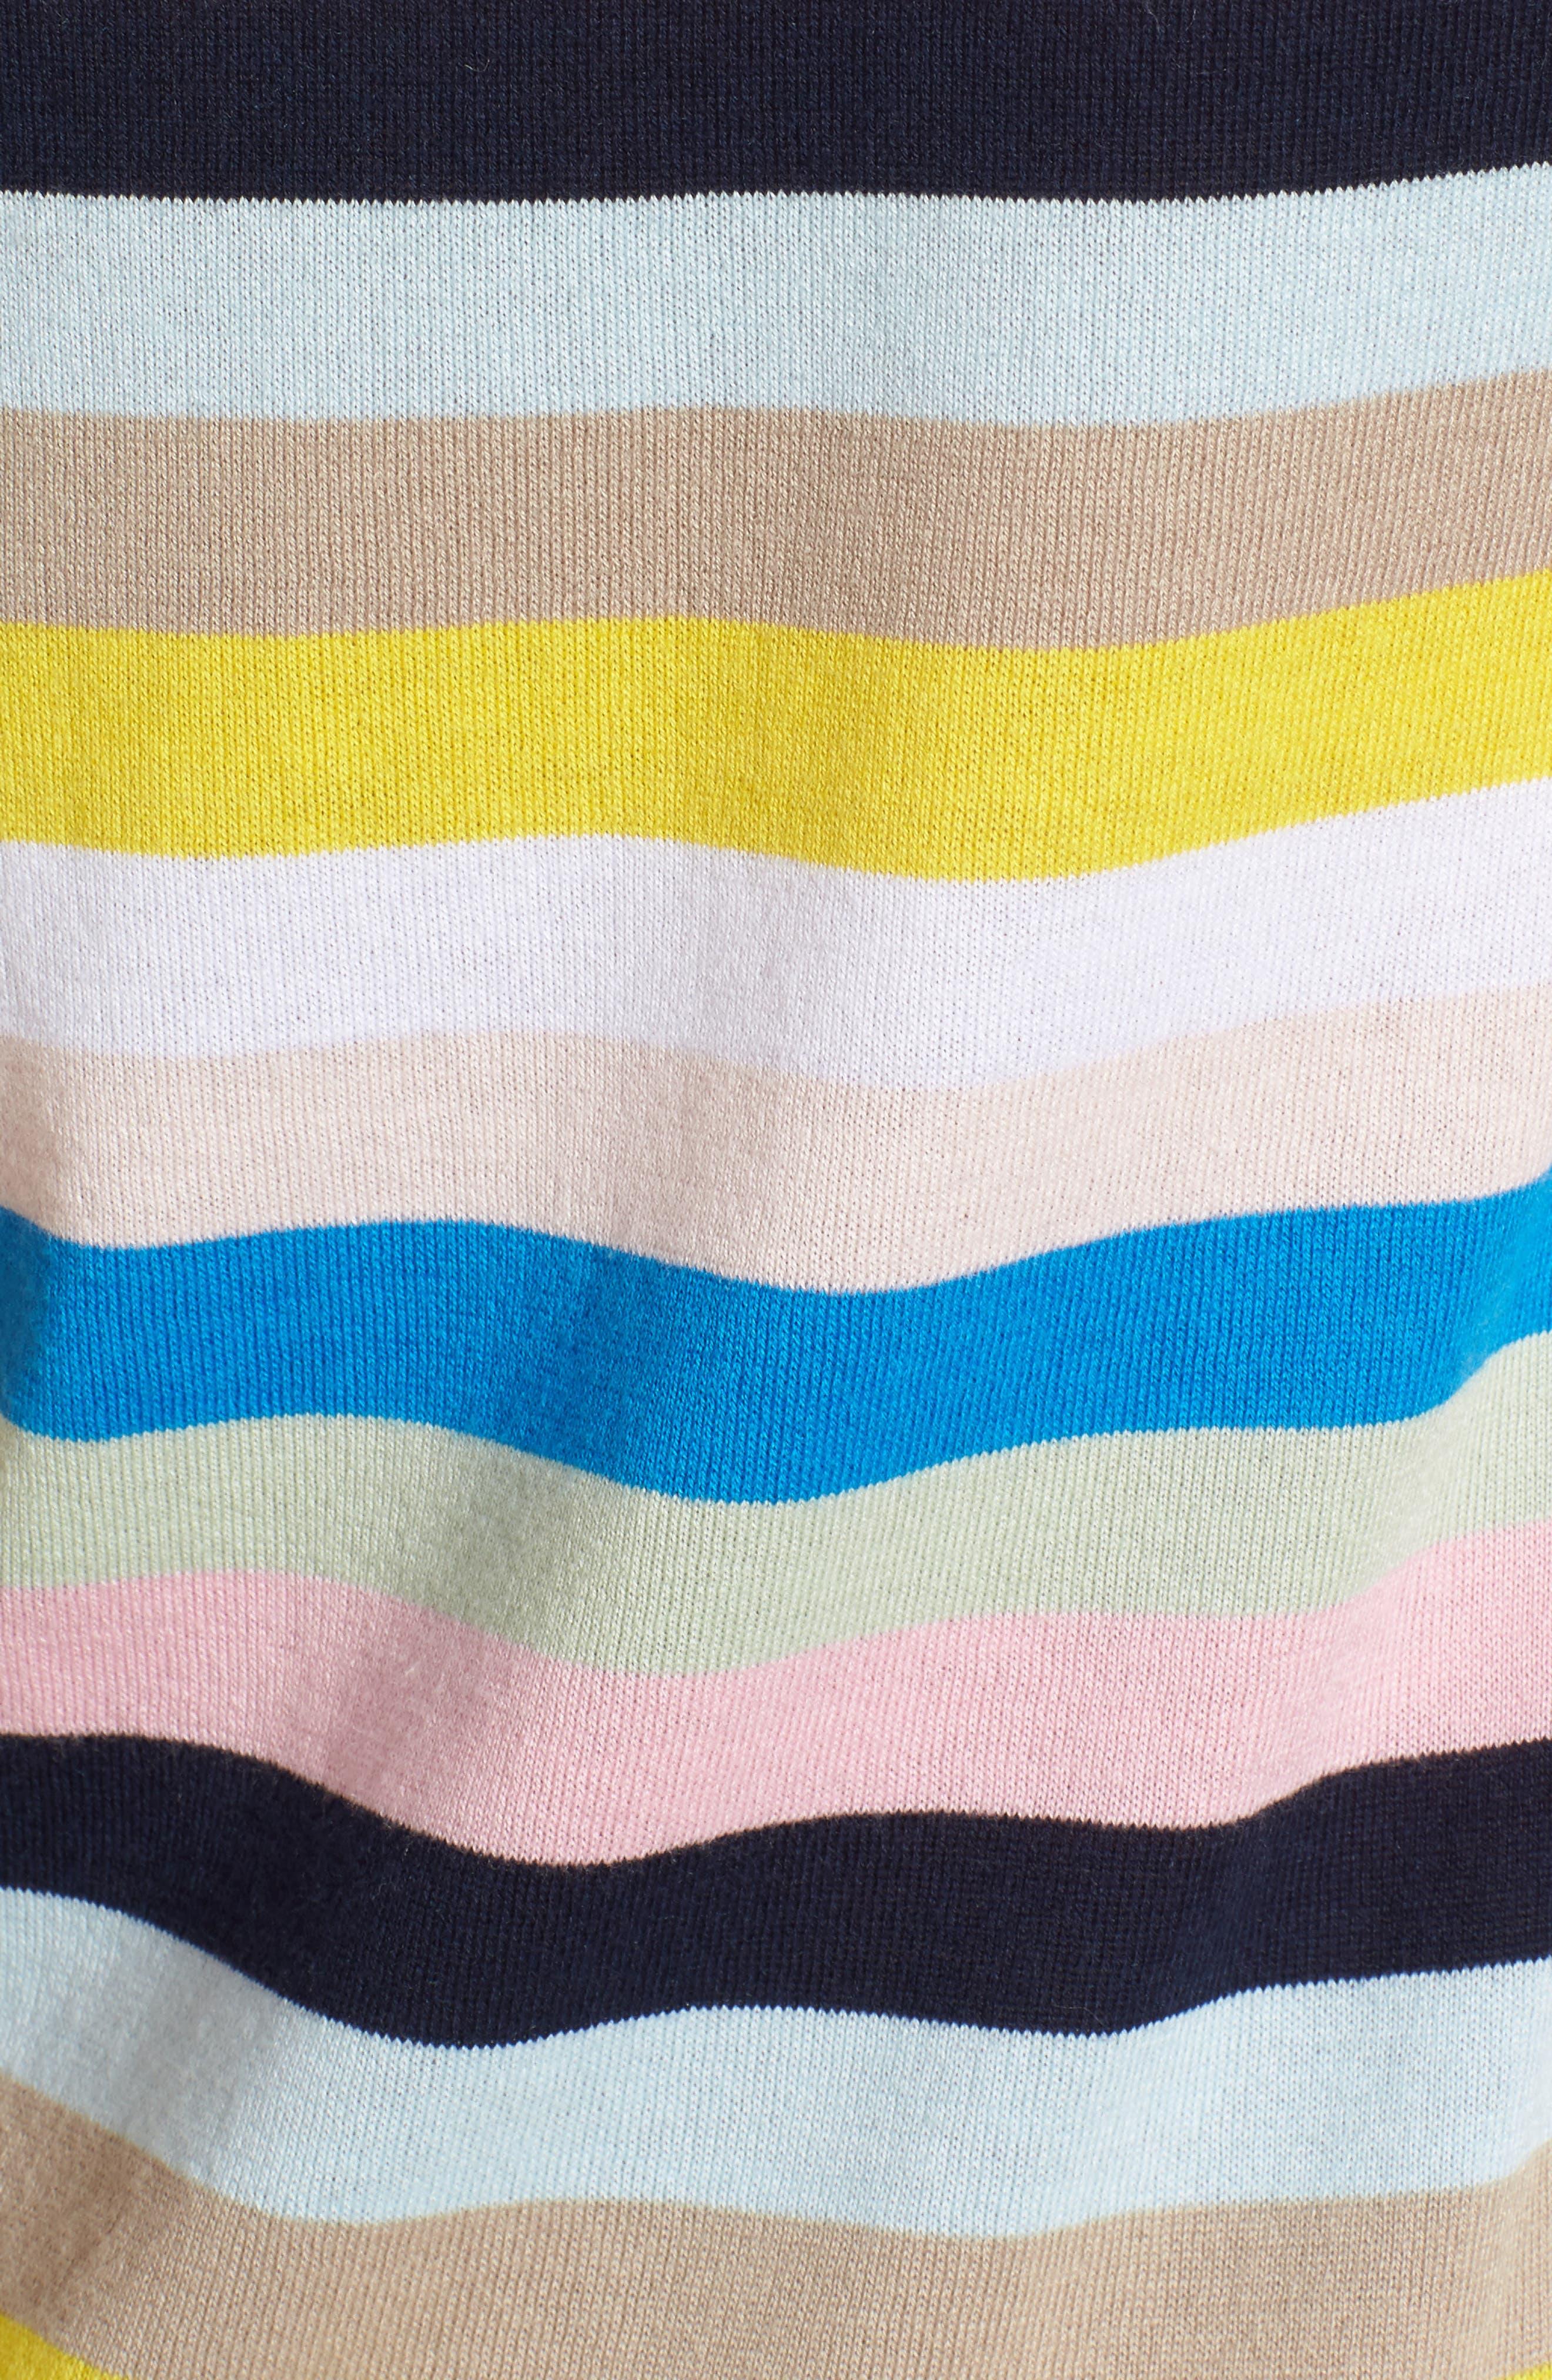 Crewneck Sweater,                             Alternate thumbnail 6, color,                             Blue Multi Stripe